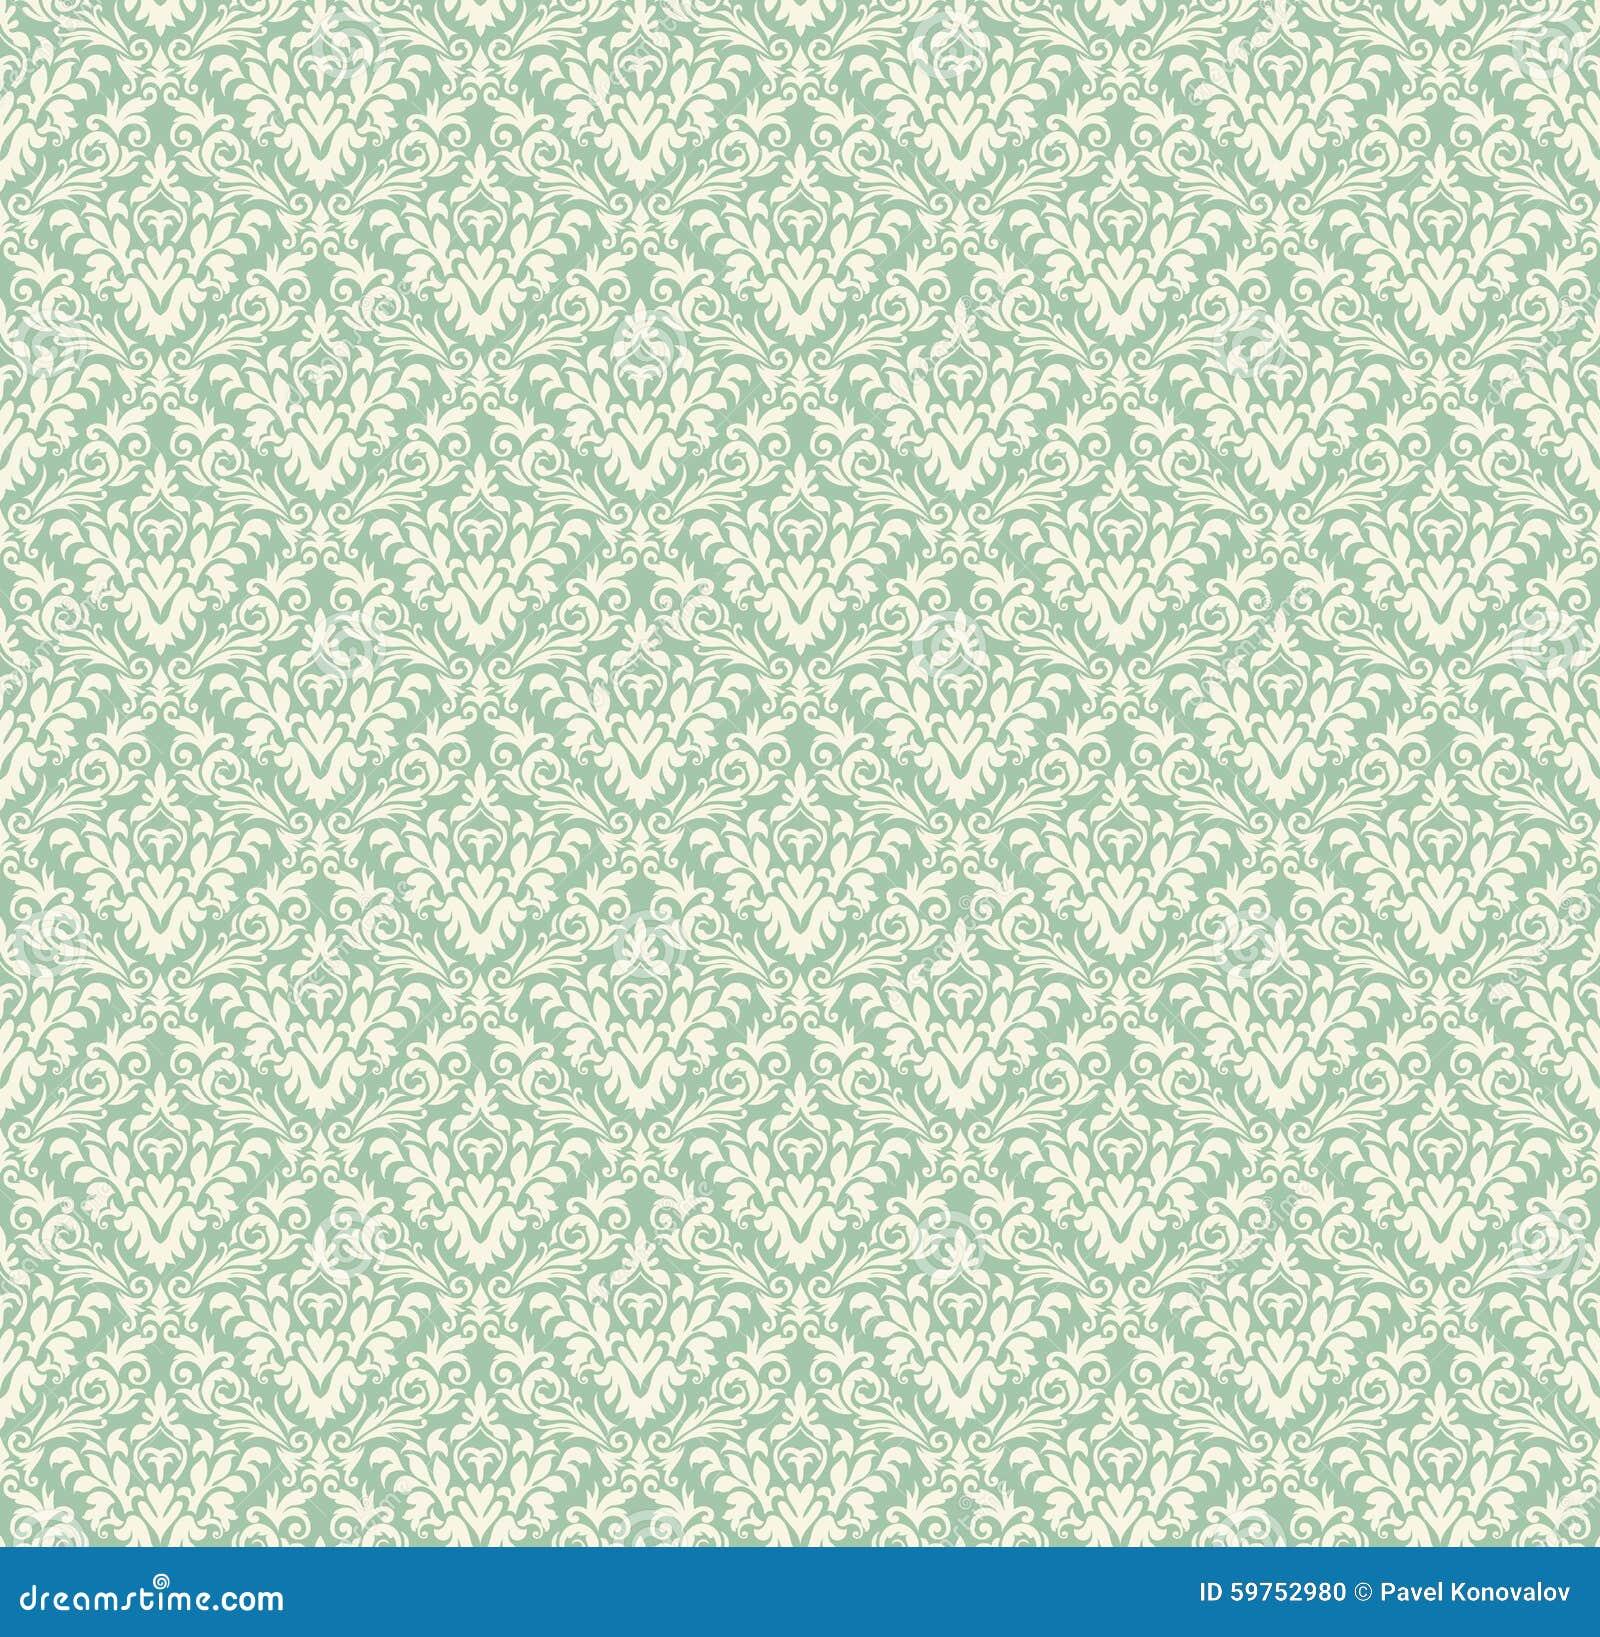 swirling royal pattern wallpaper - photo #31